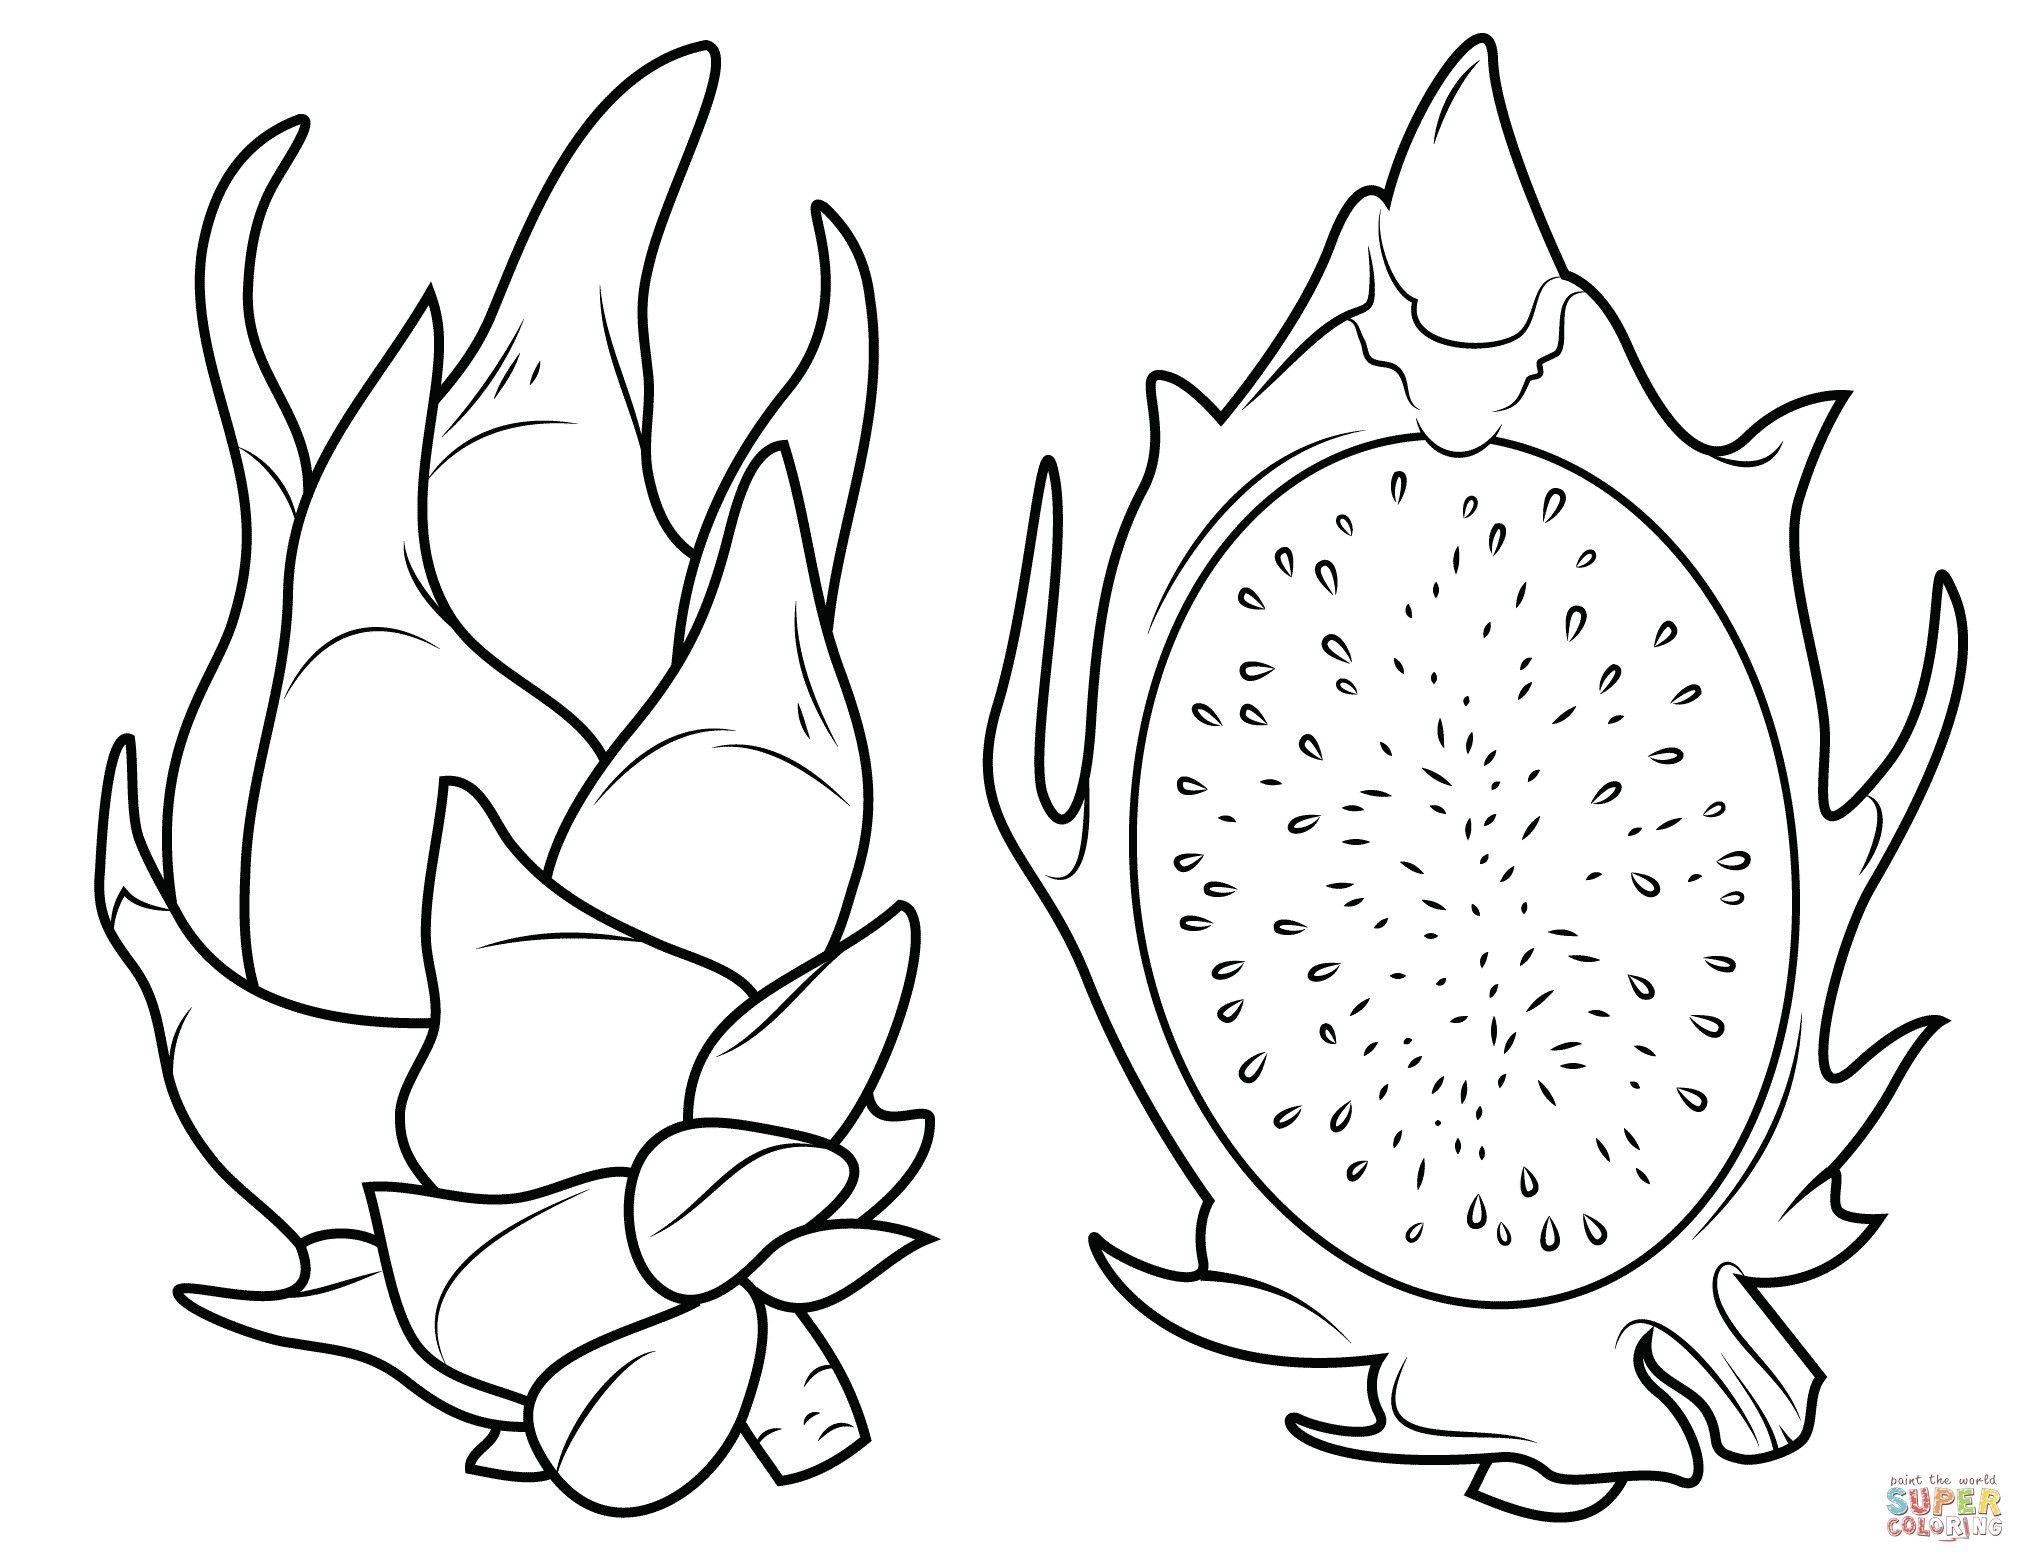 Jackfruit Coloring Pages Free Desenhos Para Colorir Frutas Para